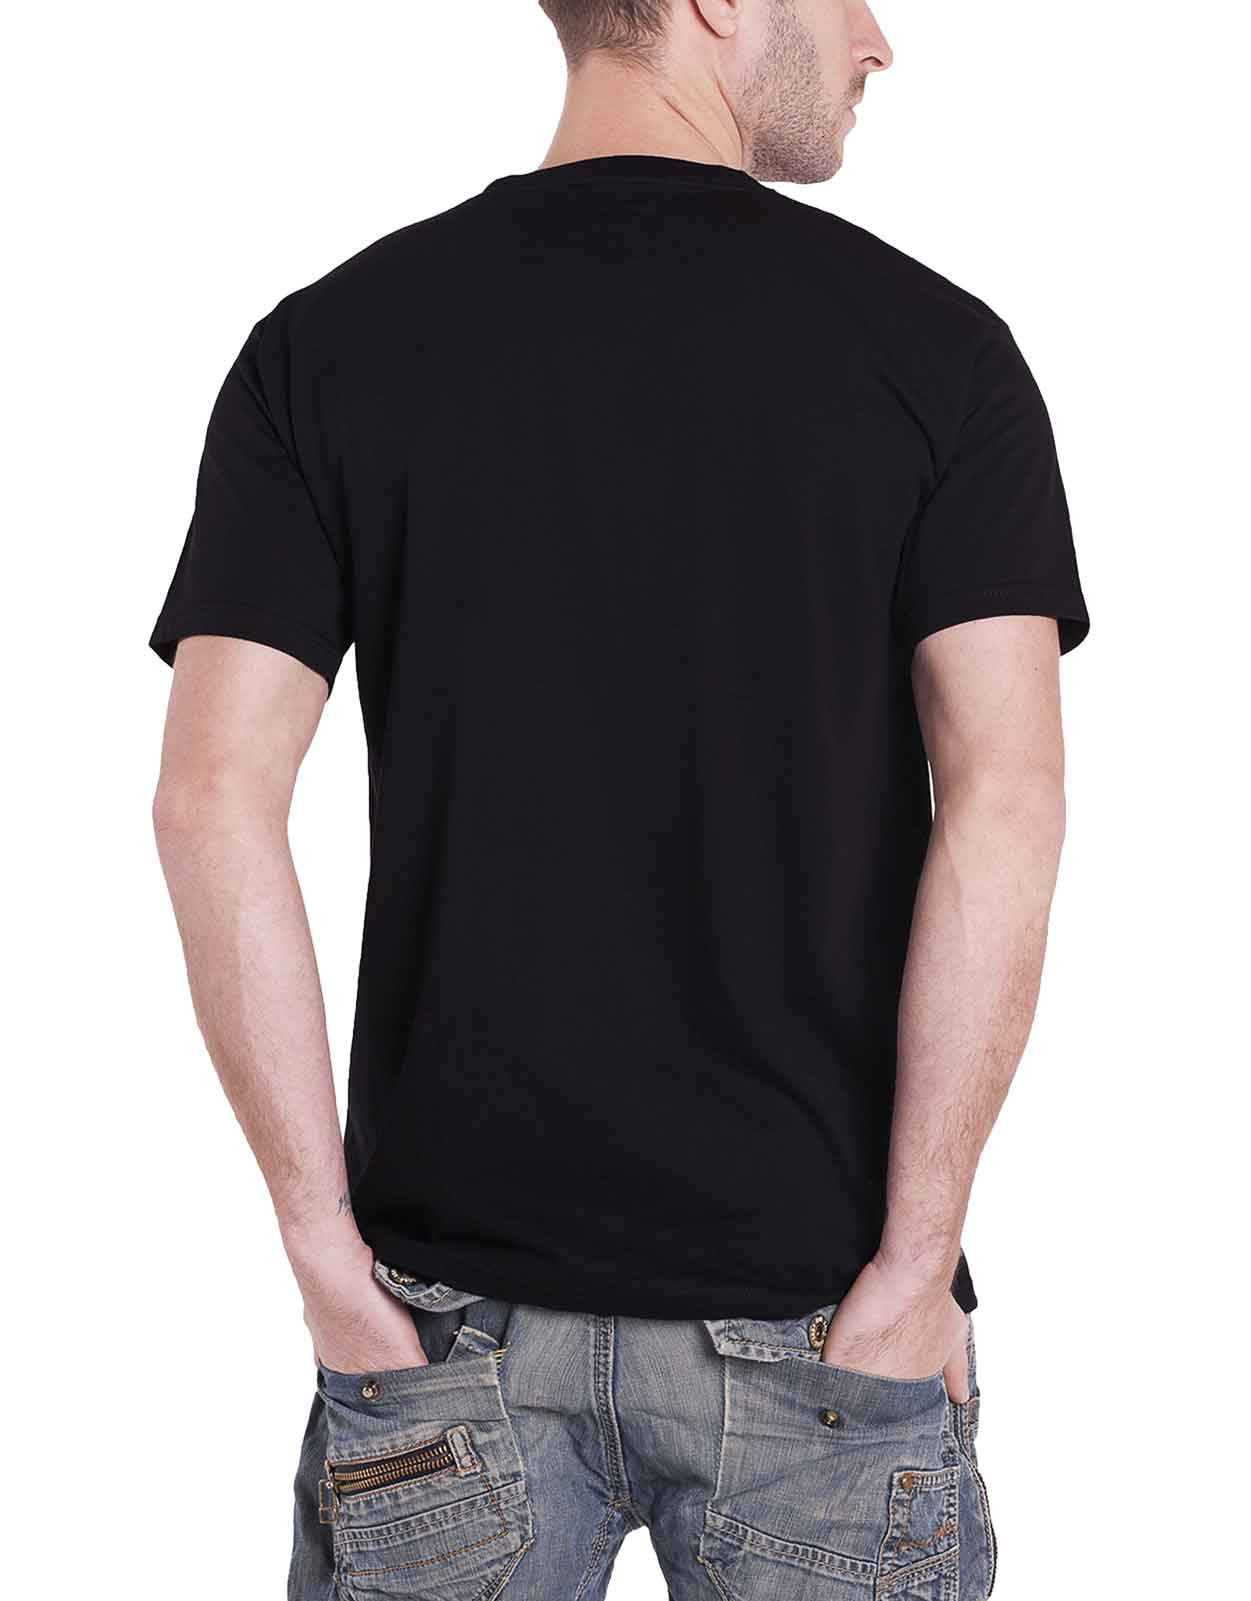 Officiel-Metallica-T-shirt-filaire-justice-for-all-RTL-Band-Logo-Homme-Nouveau miniature 49